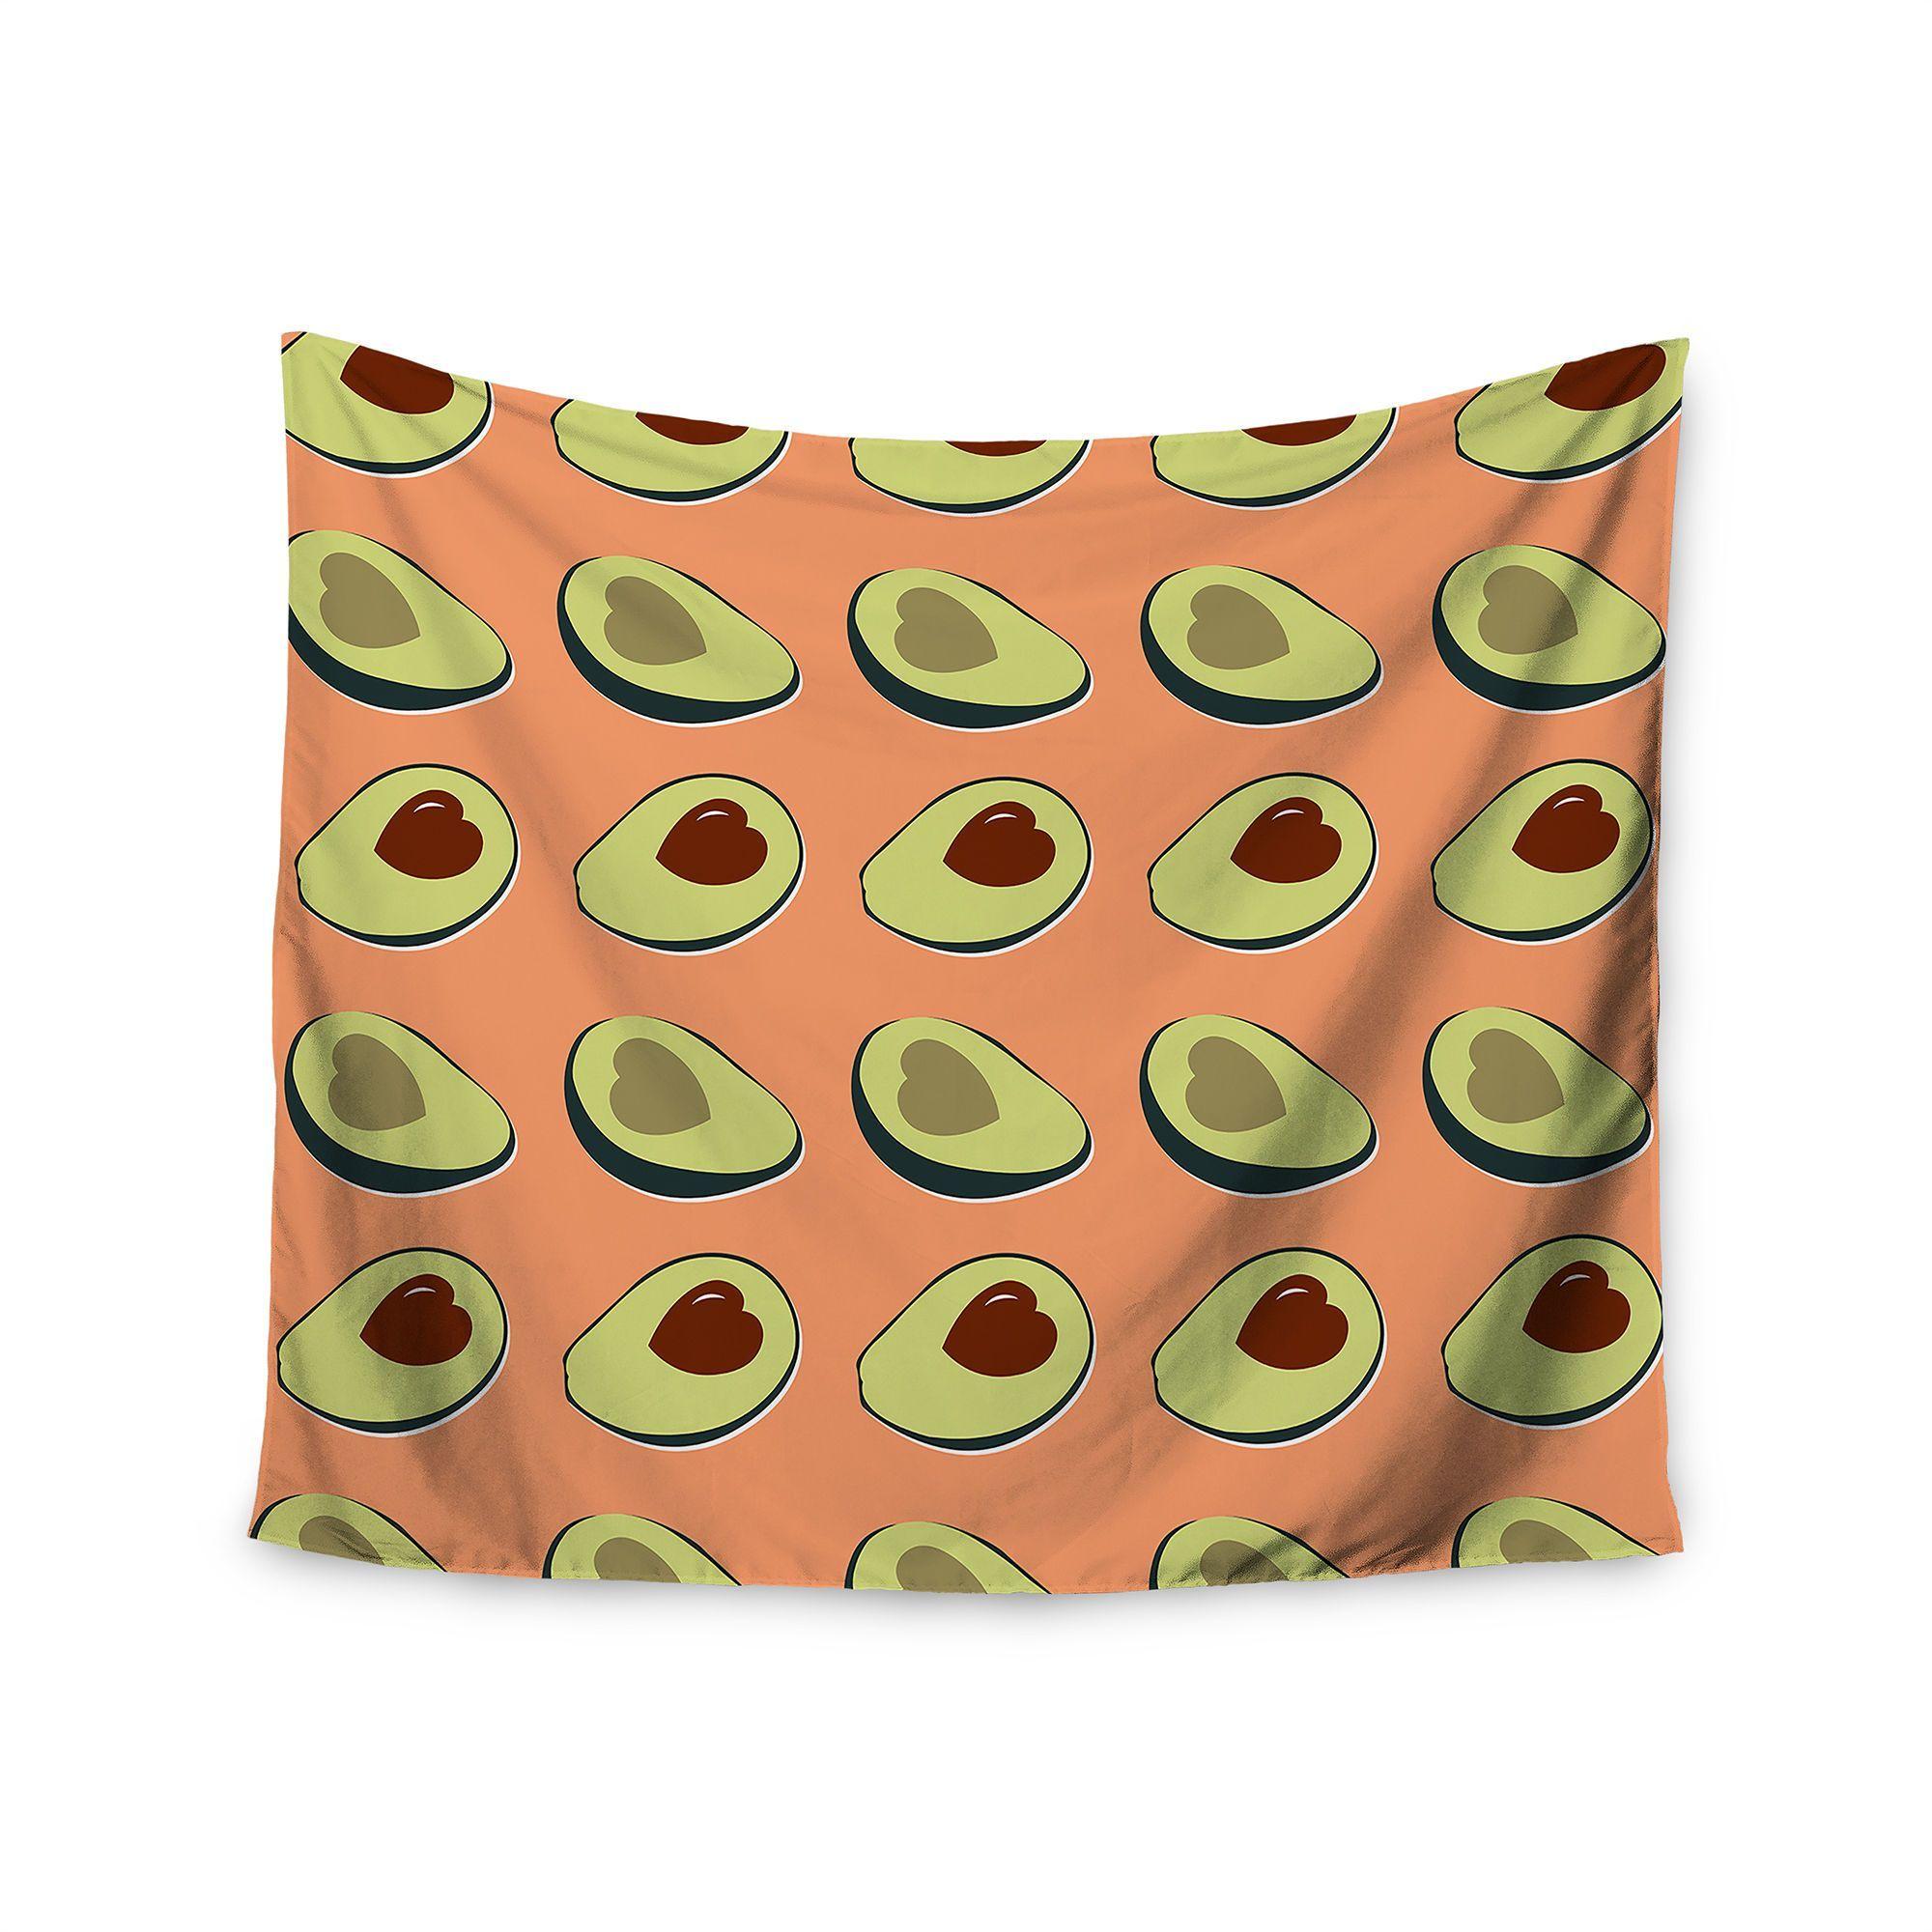 Kess InHouse Kess Original 'Avacado Love' Food 51x60-inch Tapestry